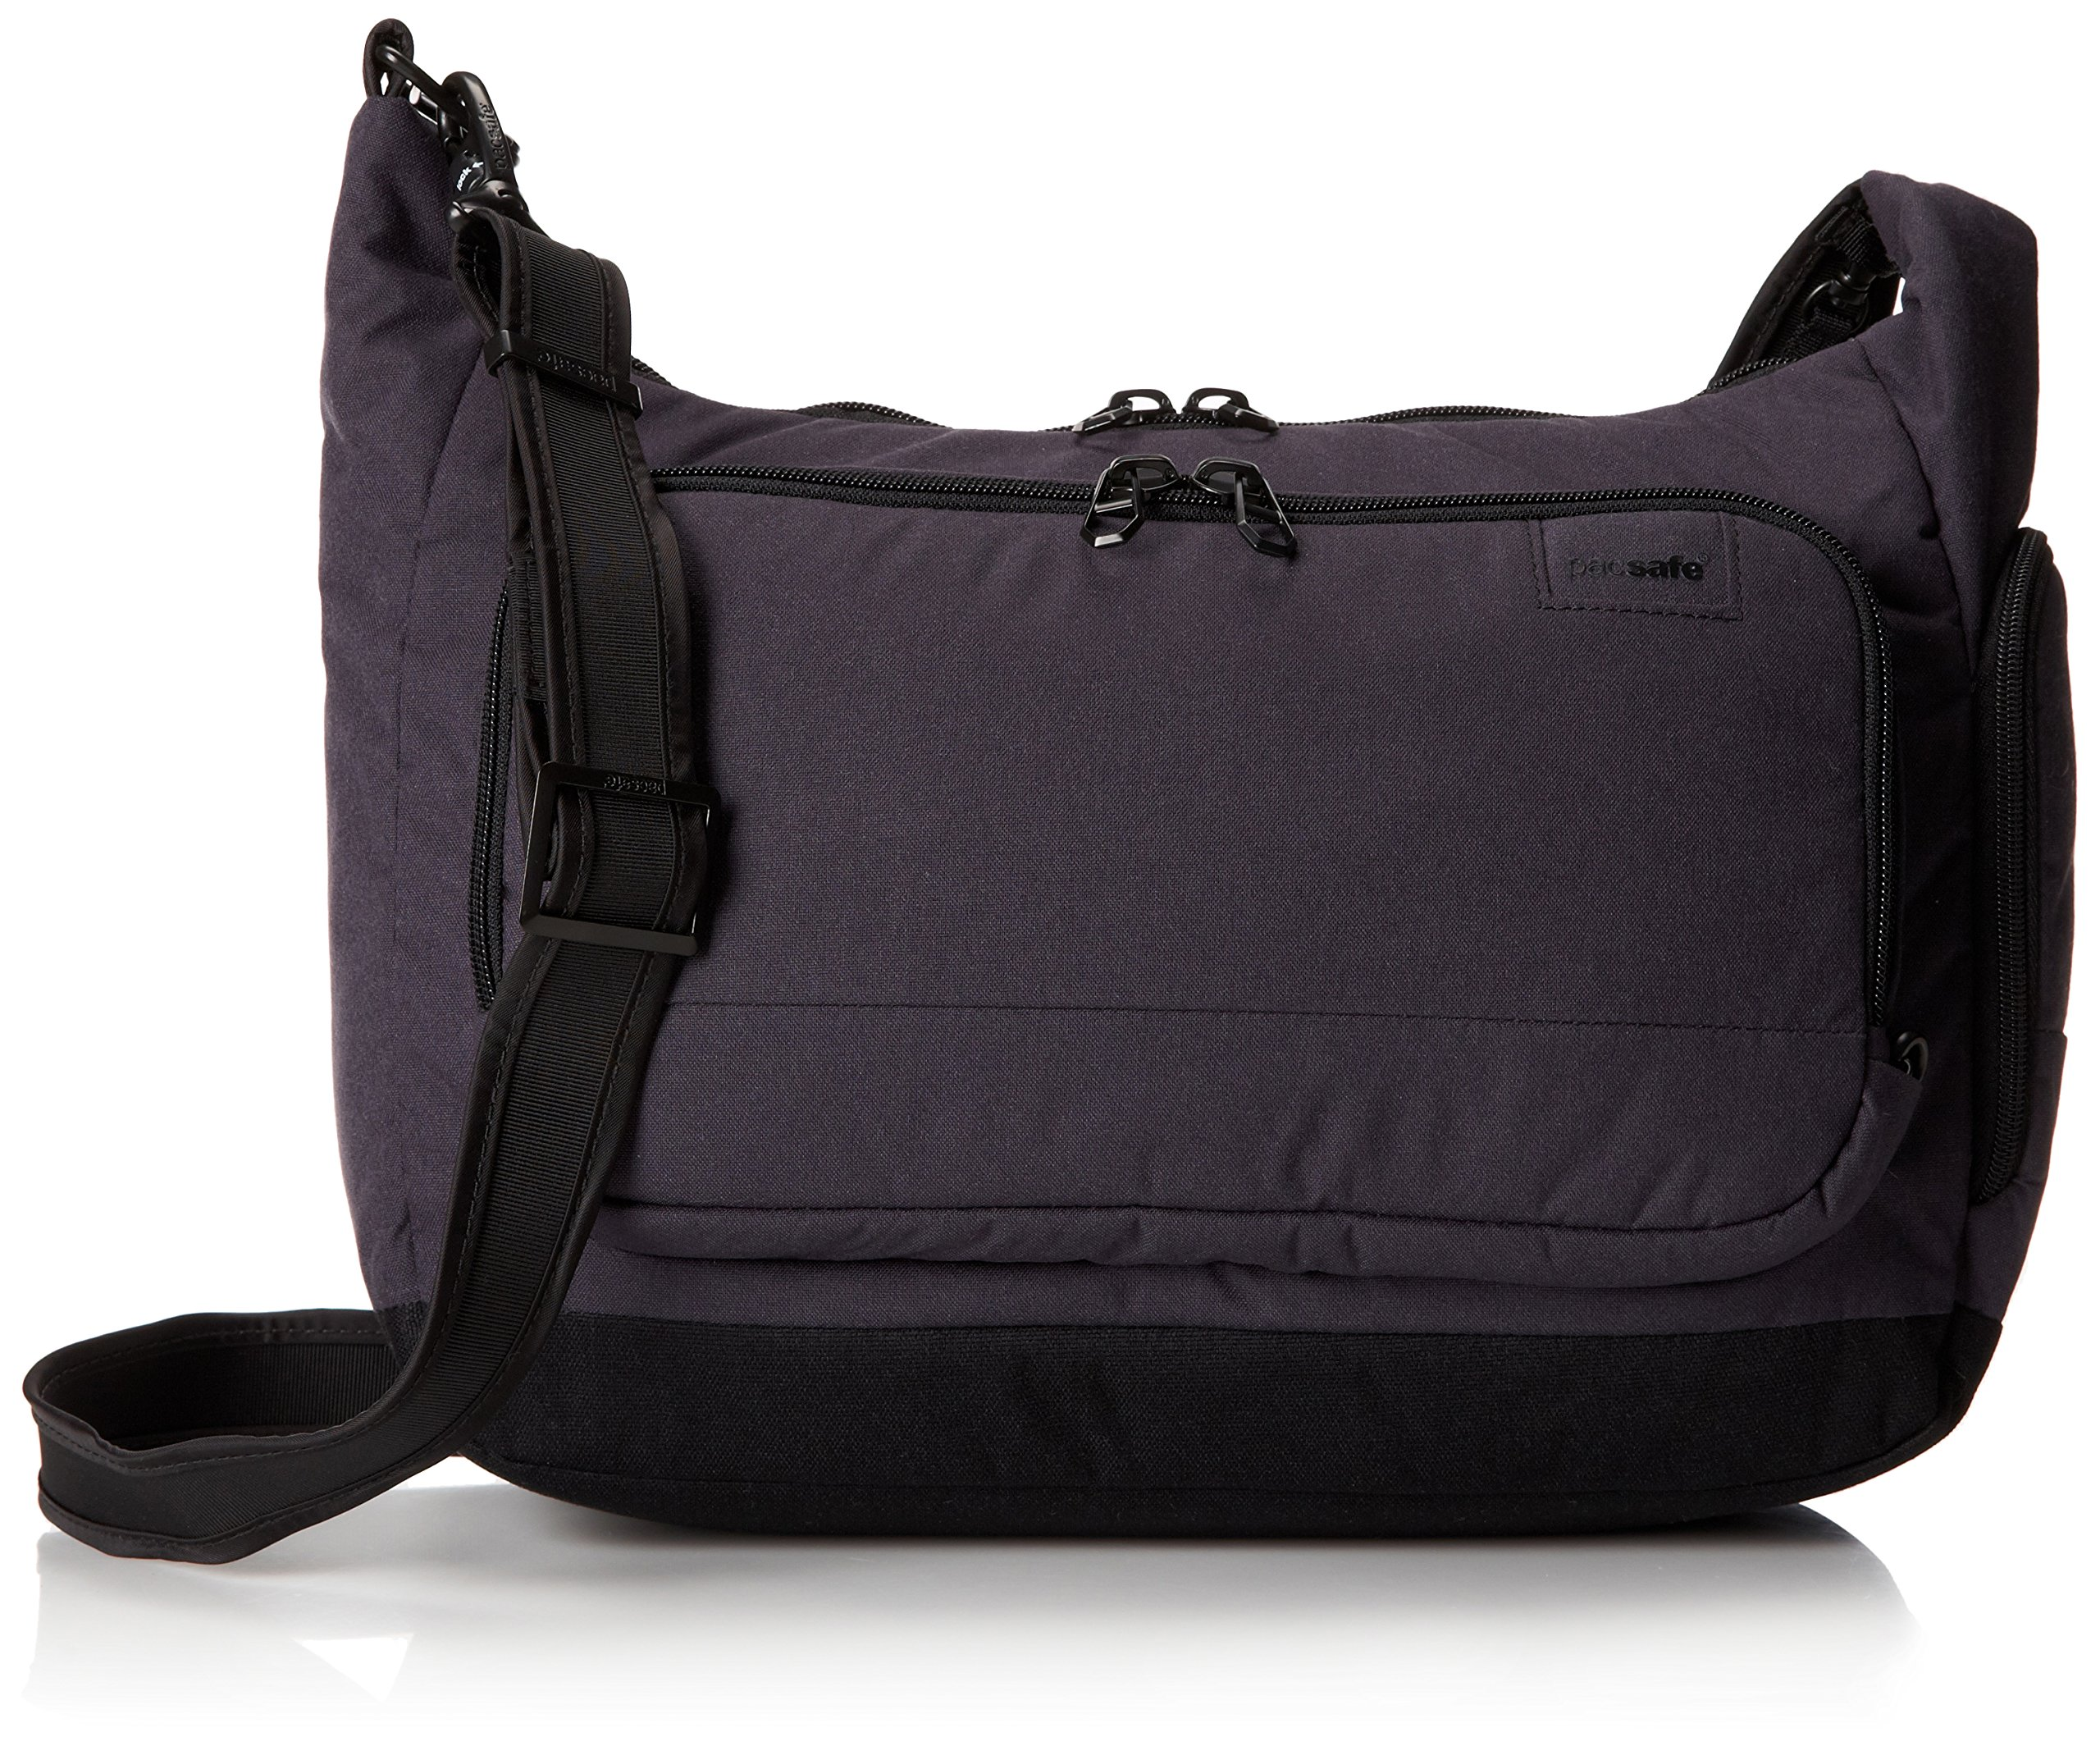 Pacsafe Citysafe LS200 Anti-Theft Handbag, Black